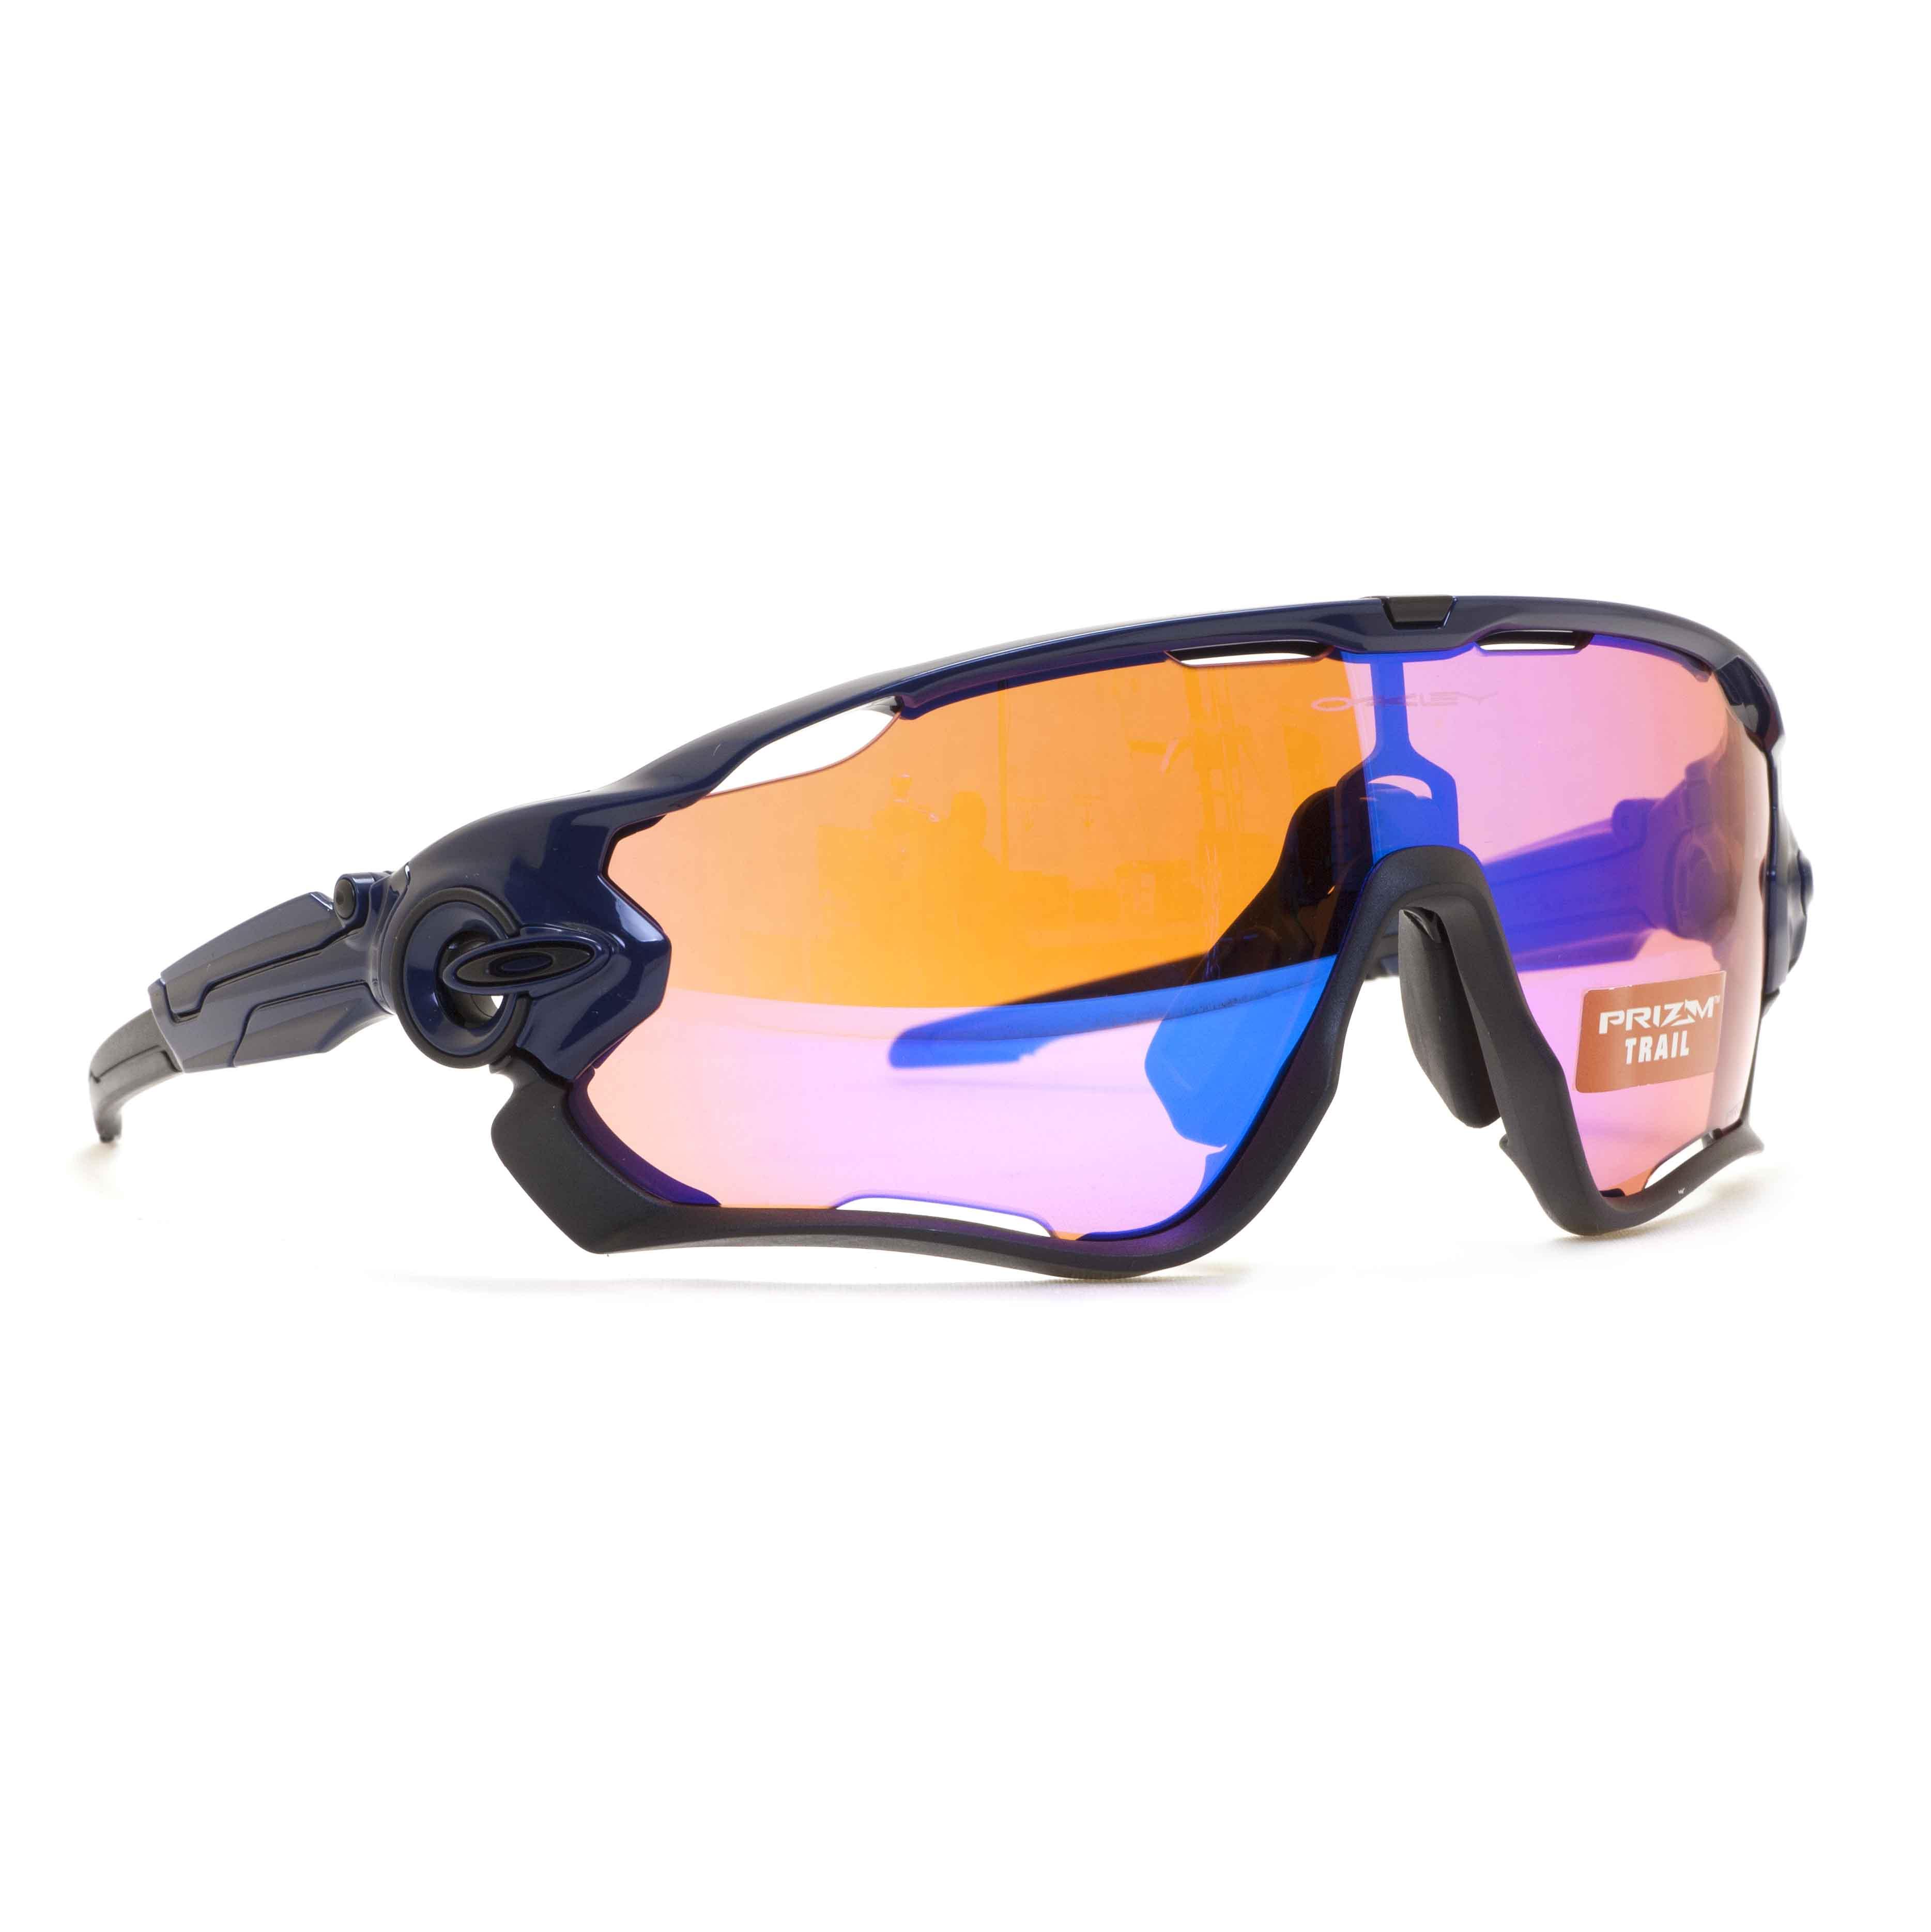 94174cefe9 Oakley JawBreaker OO9290-04 Polished Navy Blue Shield Prizm Trail Sunglasses